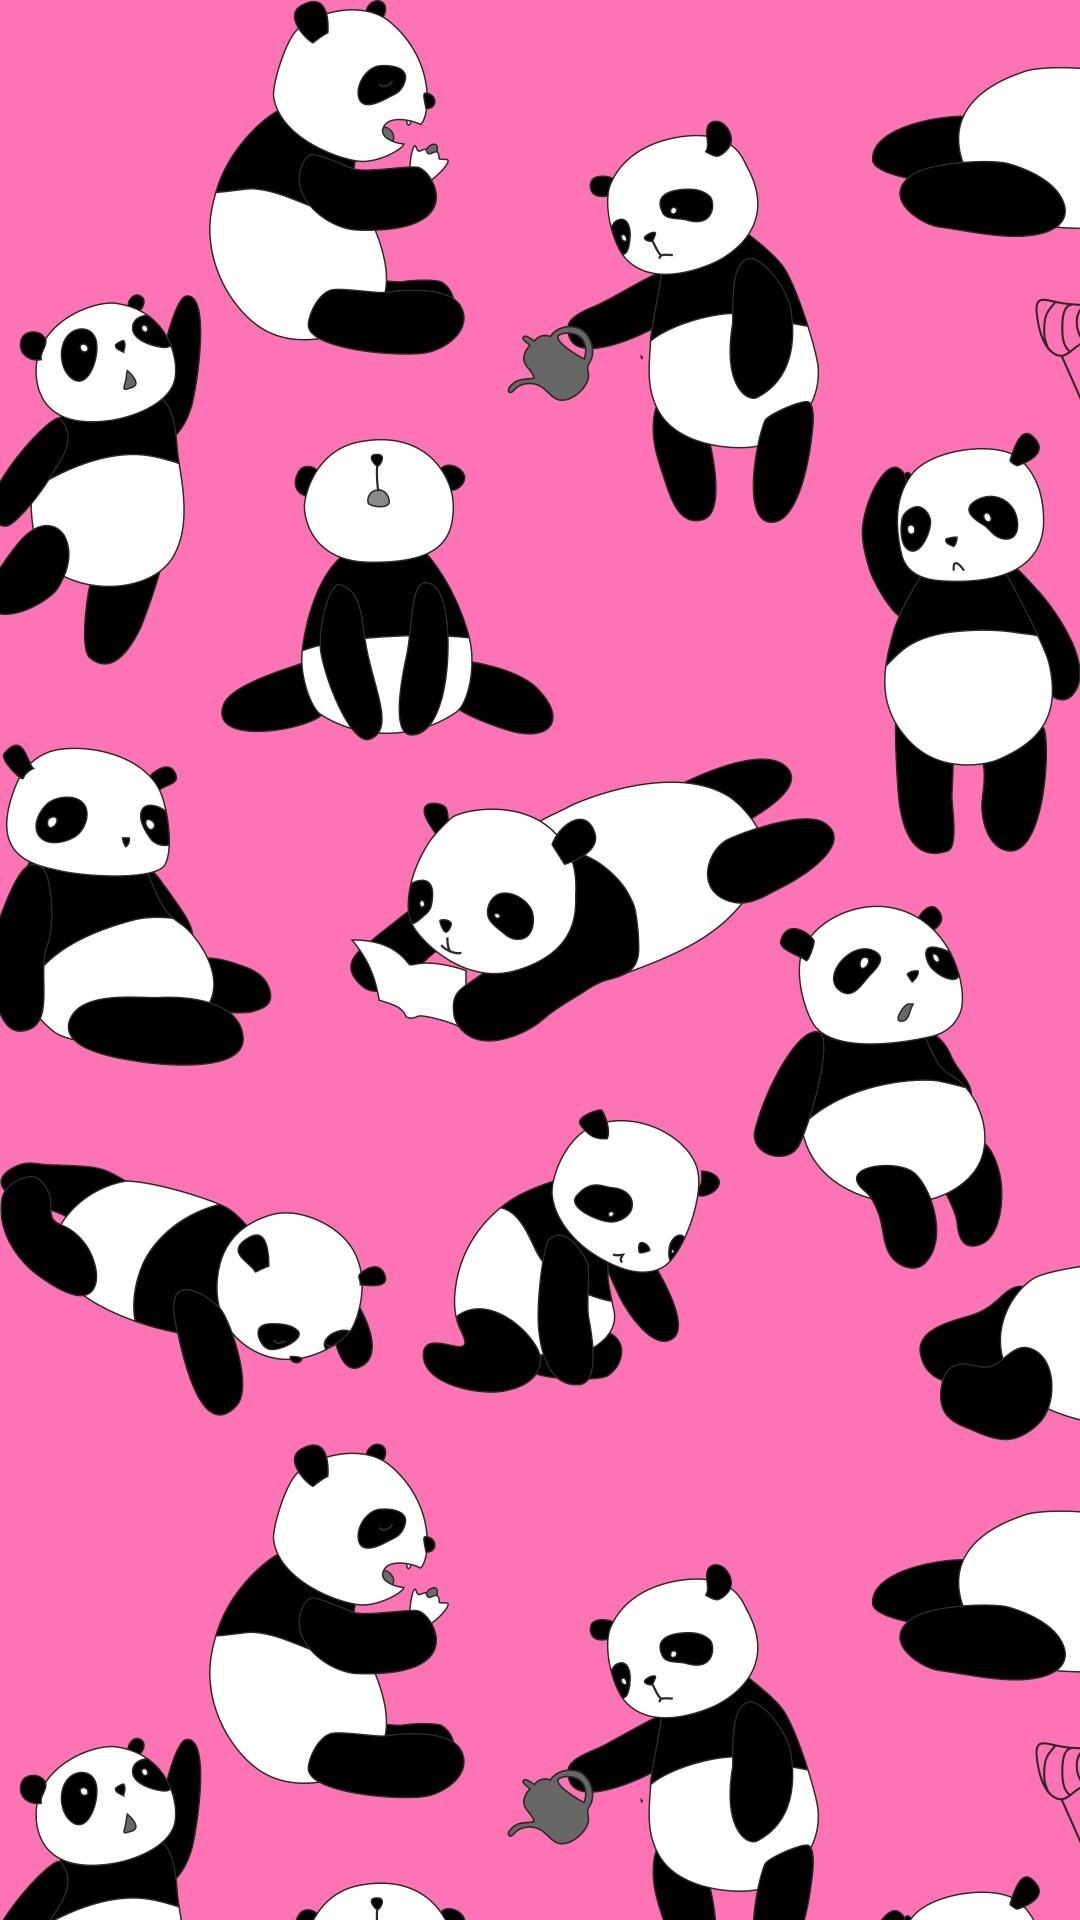 Most Inspiring Wallpaper Cell Phone Panda